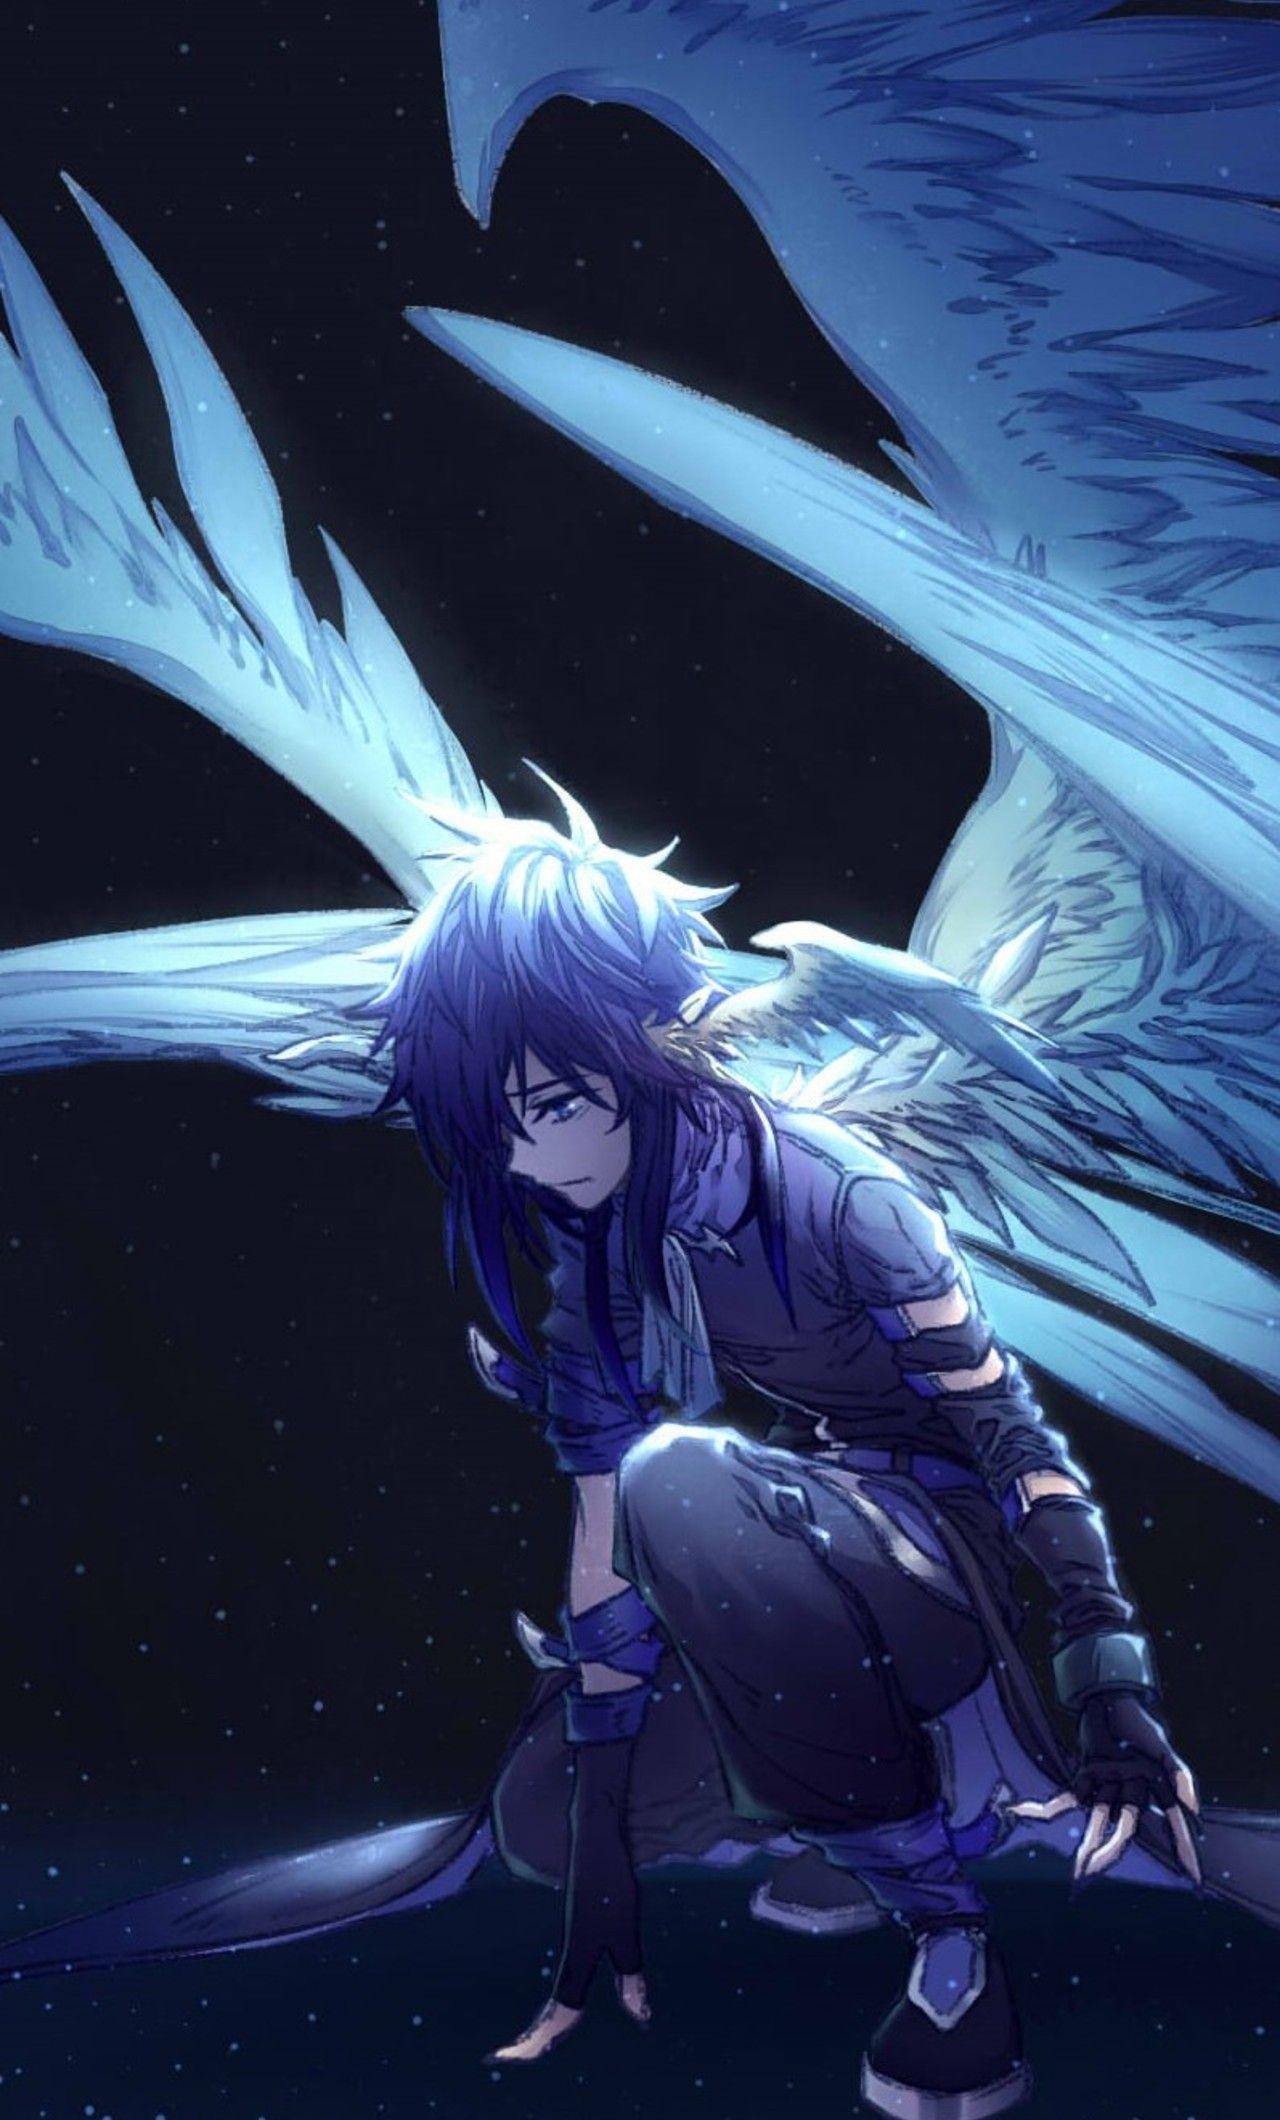 Download 7000+ Wallpaper Iphone Anime 4k HD